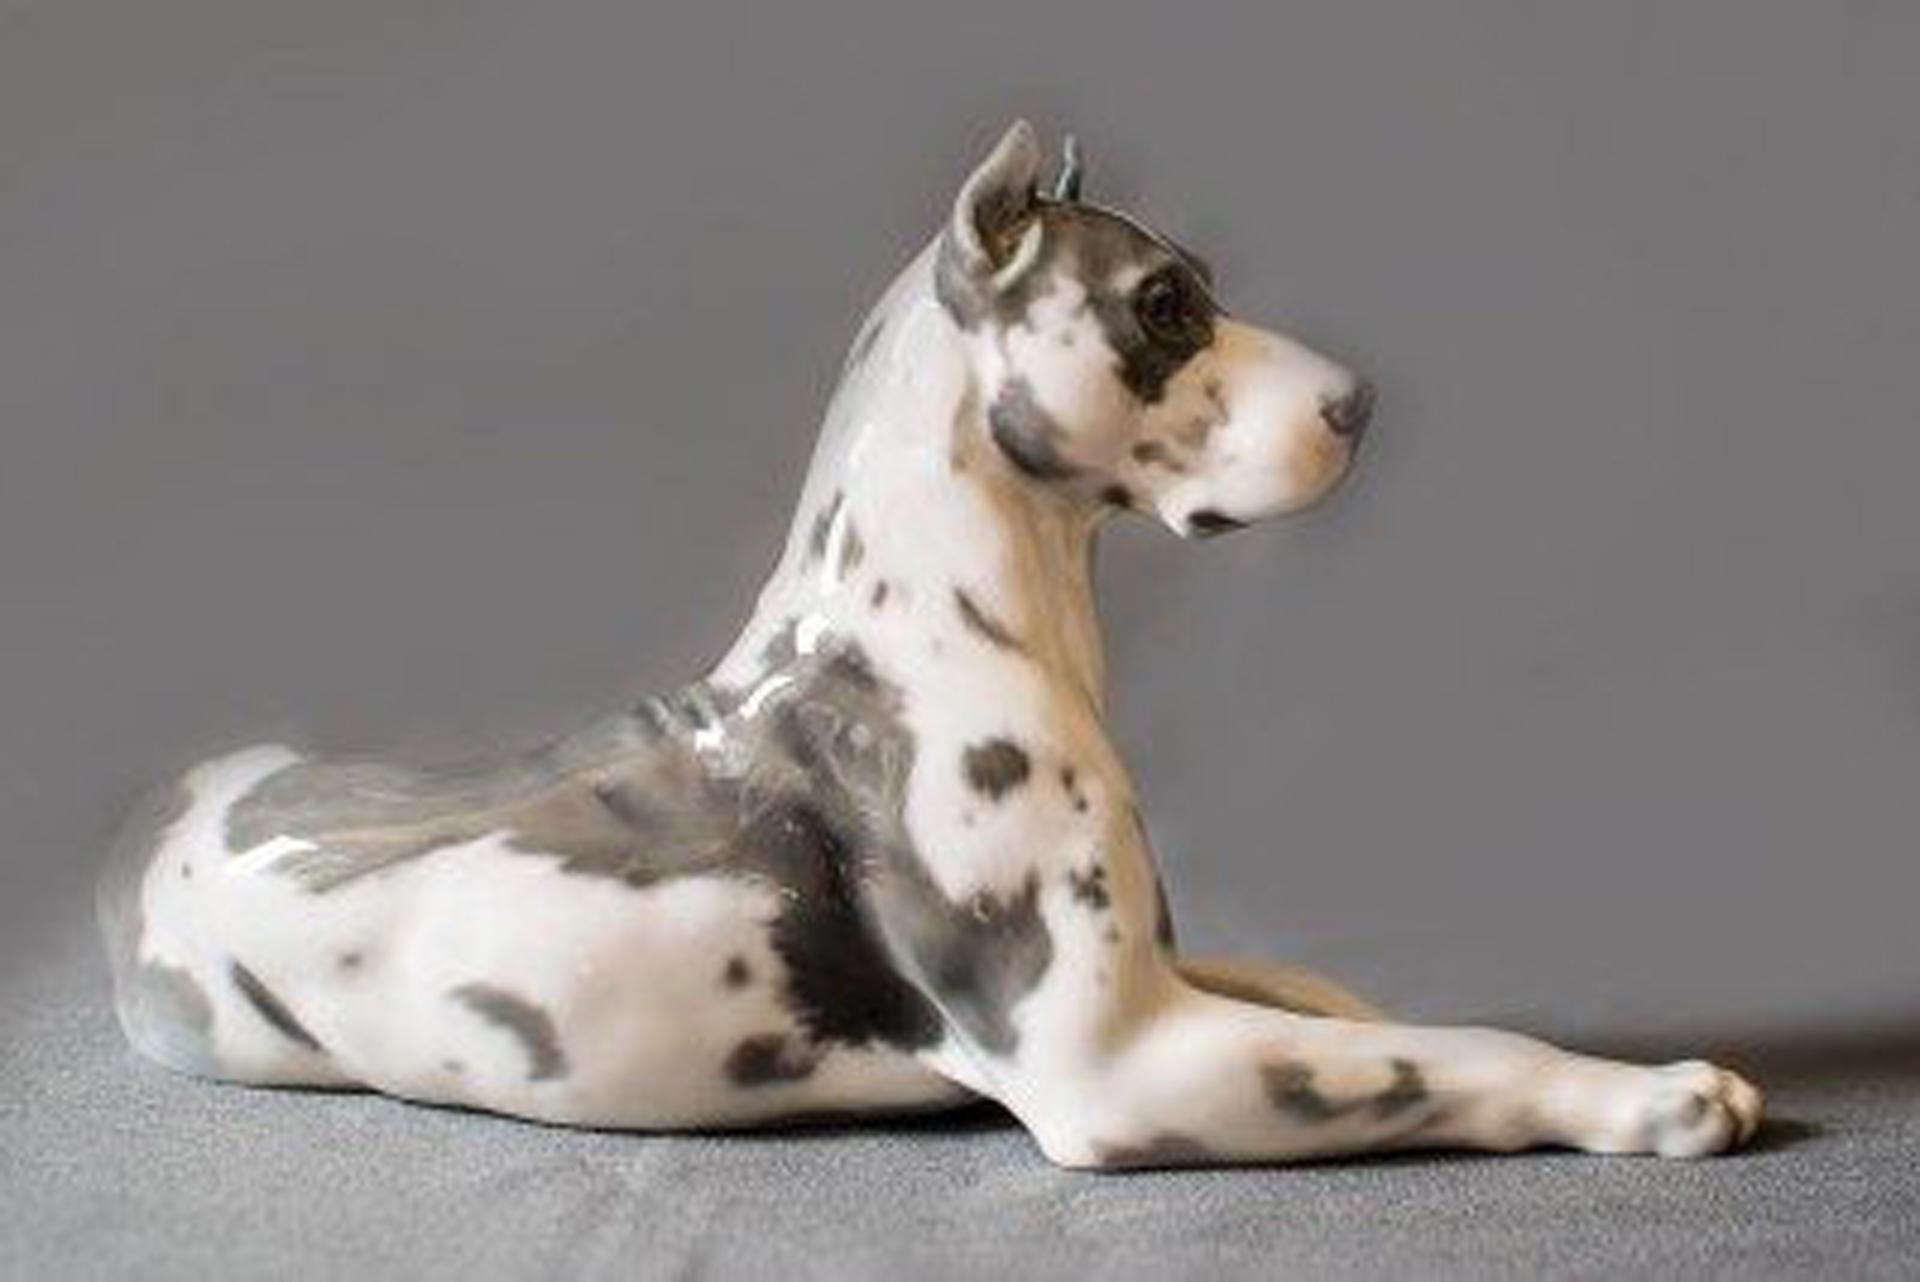 230 esculturas de porcelana de perros, una innovadora idea de Juan Carlos Rodríguez Pividal